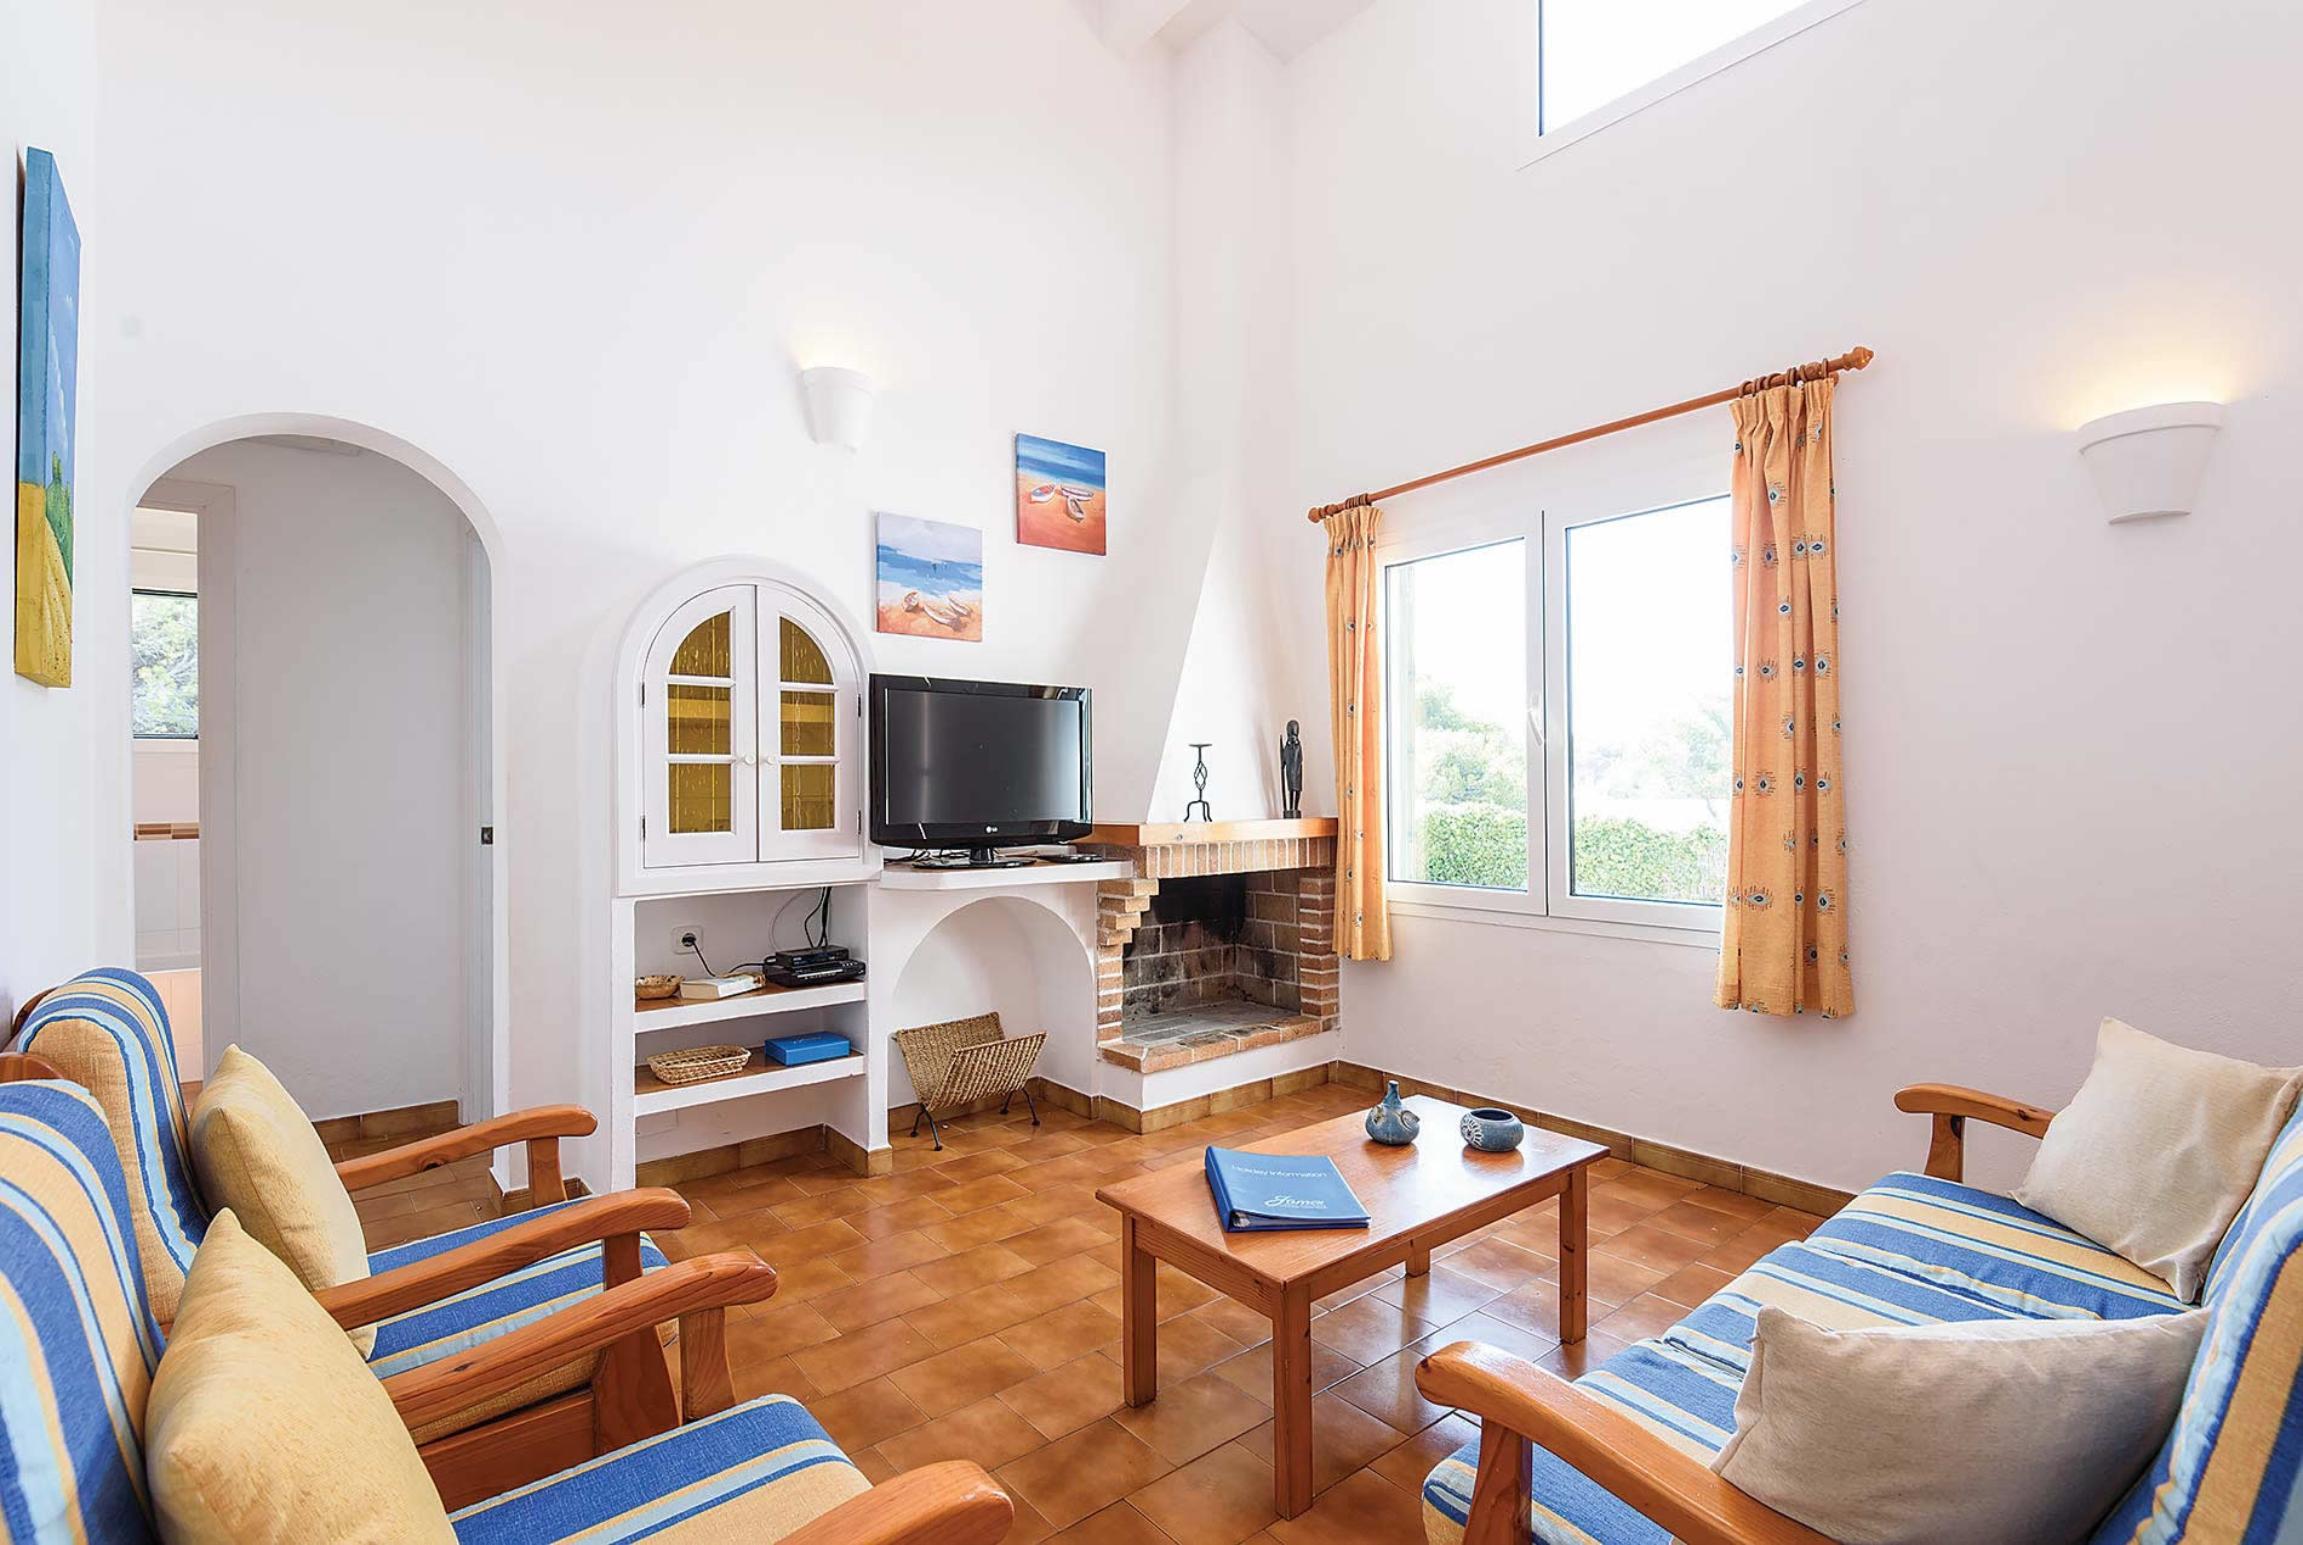 Ferienhaus Eulalia I (2653535), Arenal De'N Castell, Menorca, Balearische Inseln, Spanien, Bild 2